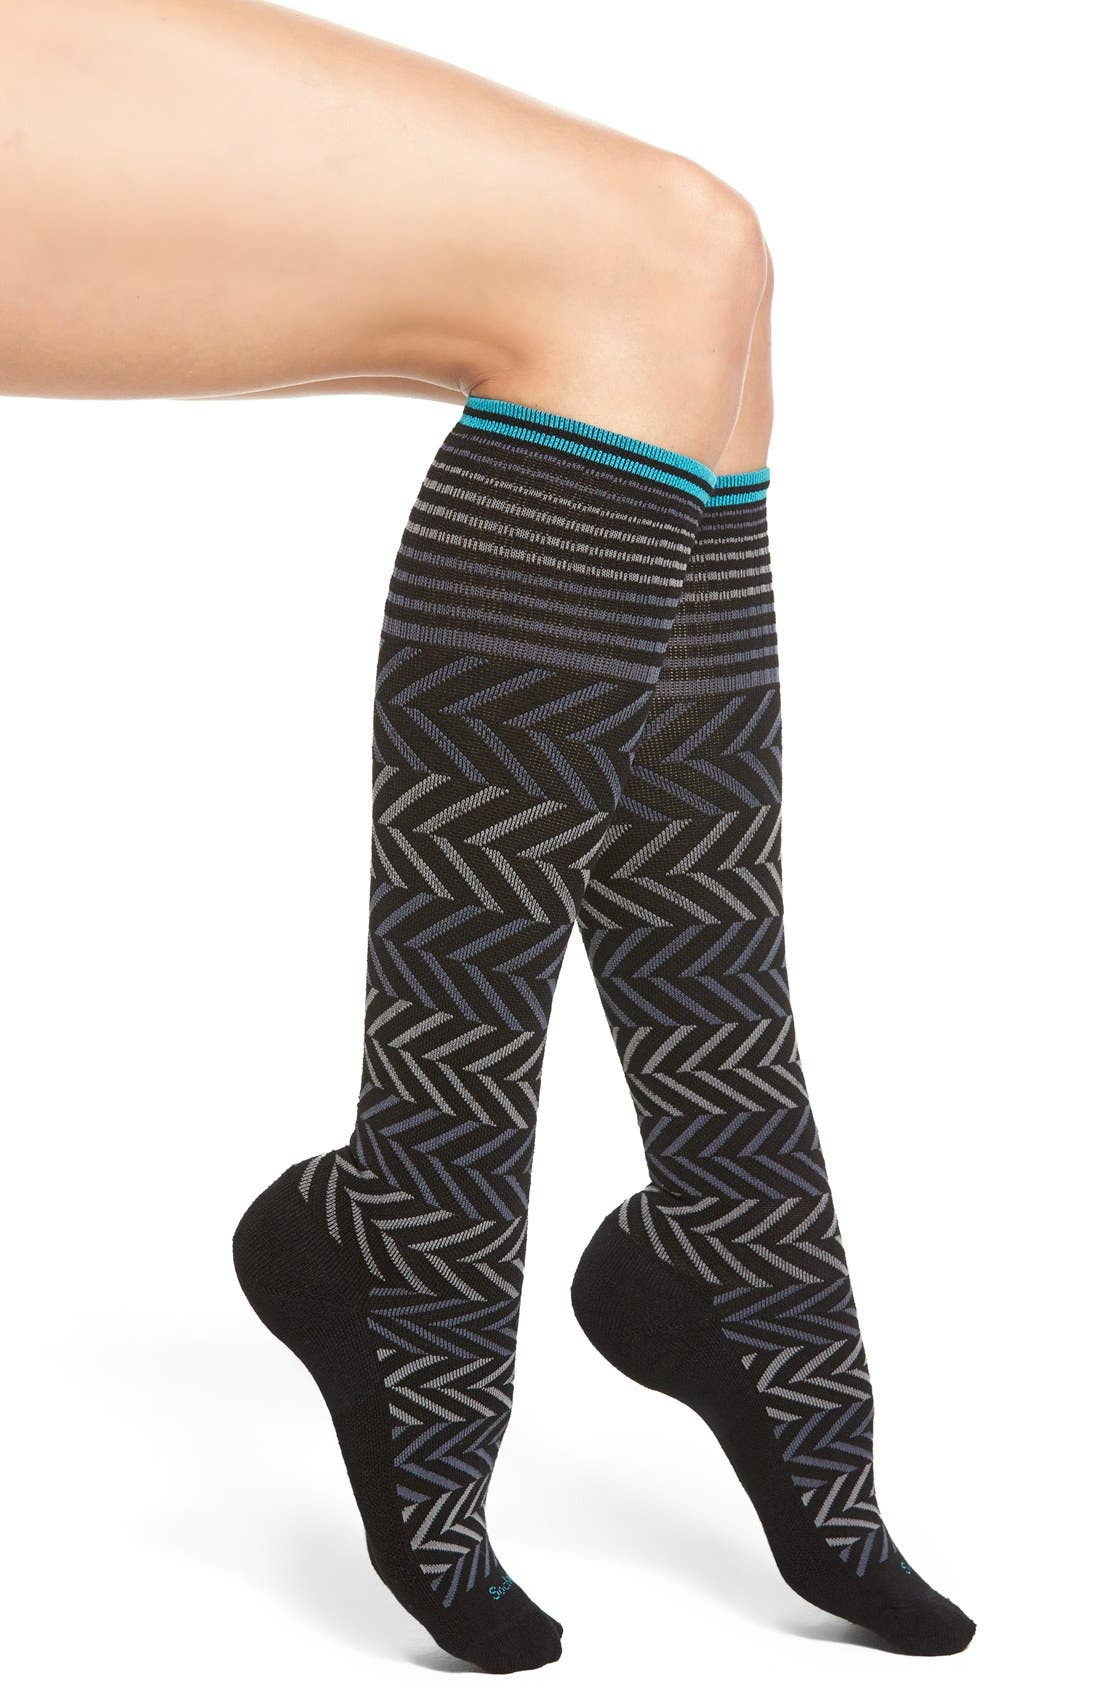 Graduated Compression Socks,                             Main thumbnail 1, color,                             Black